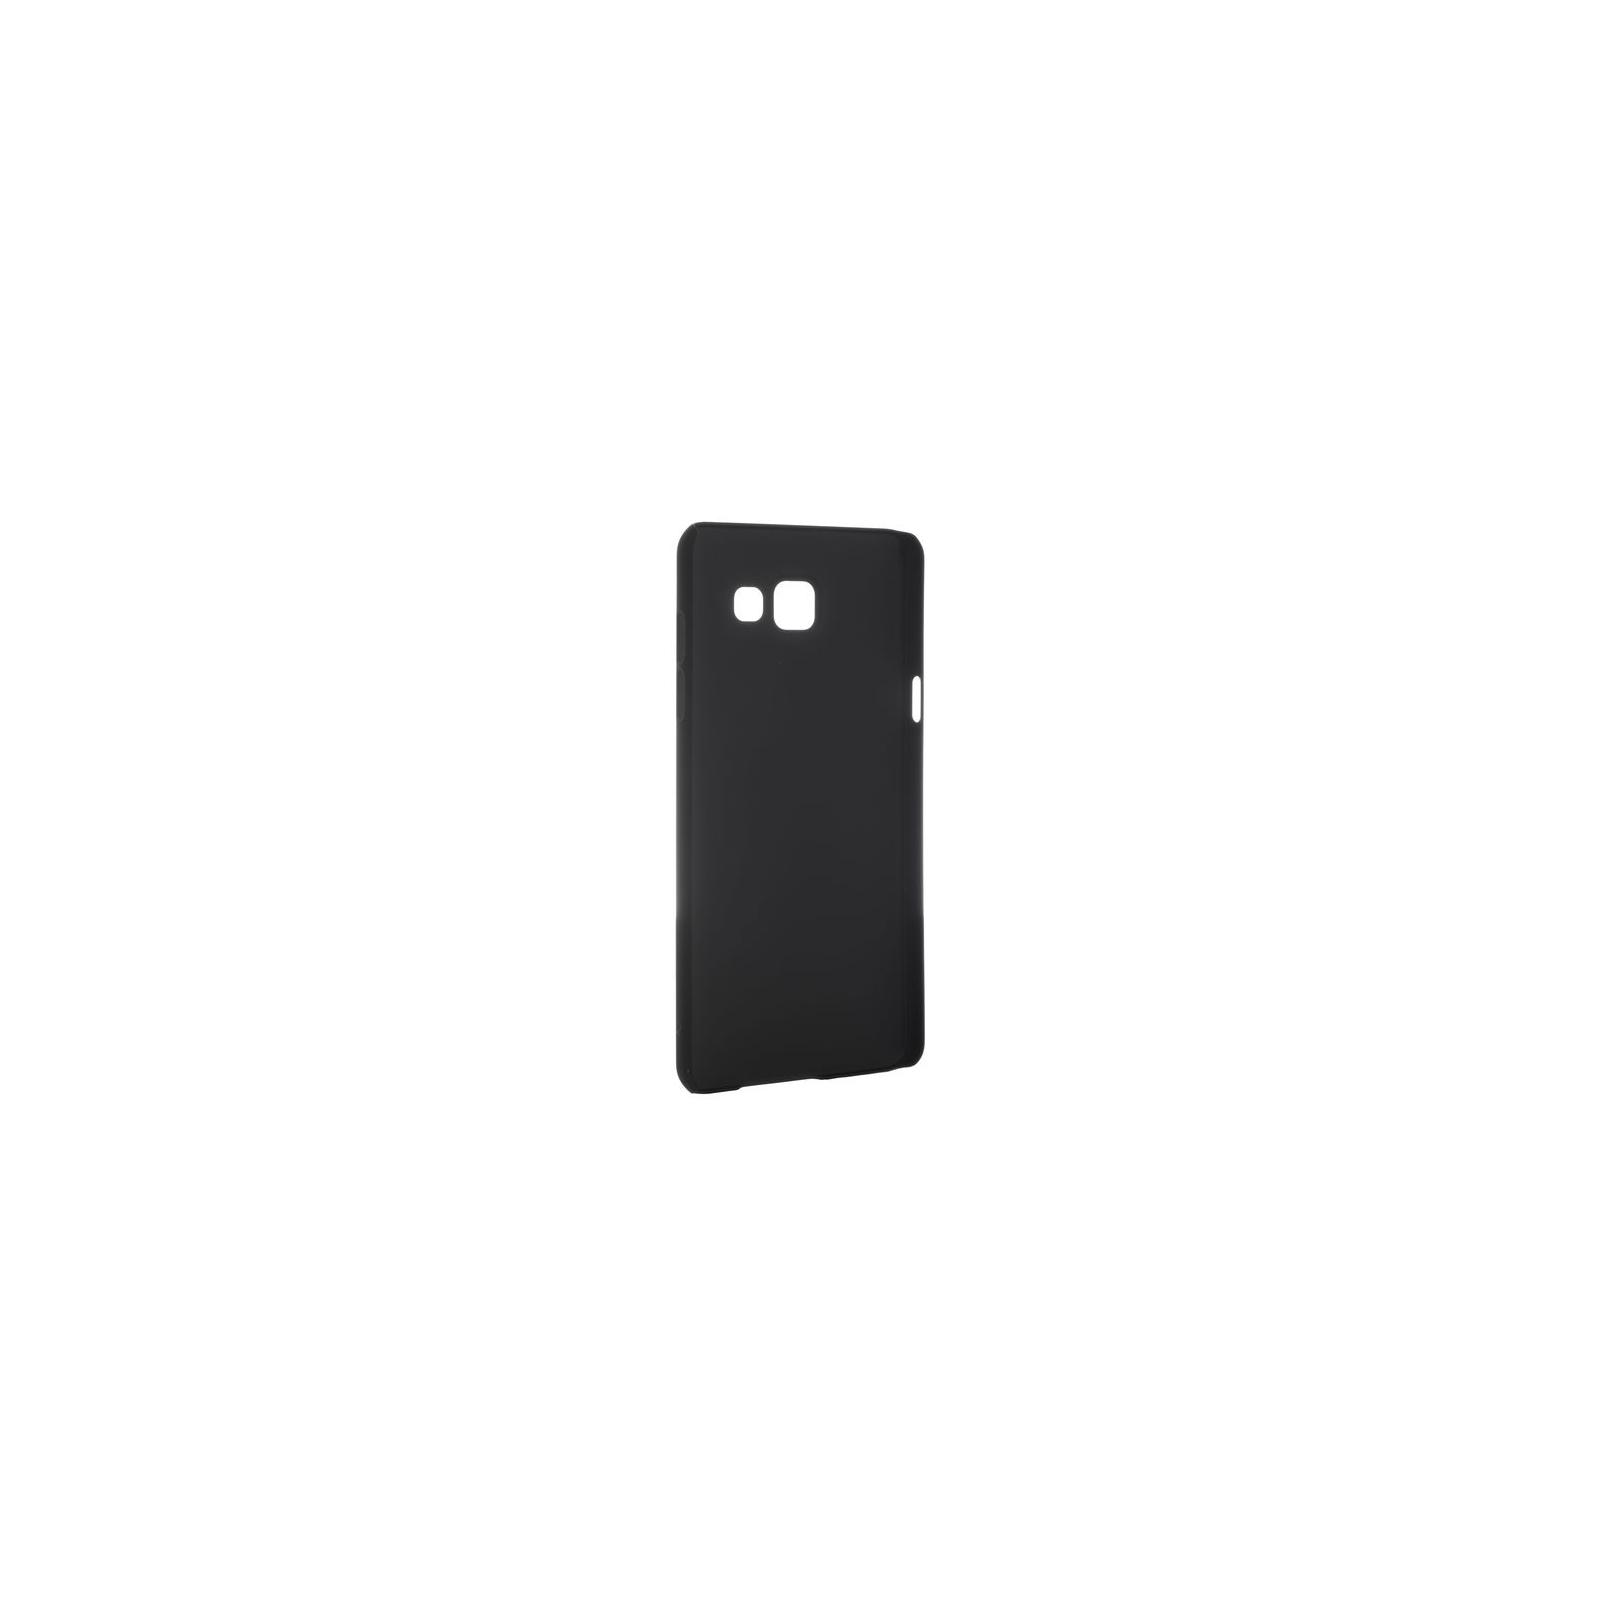 Чехол для моб. телефона NILLKIN для Samsung A7/A710 Black (6264784) (6264784) изображение 2